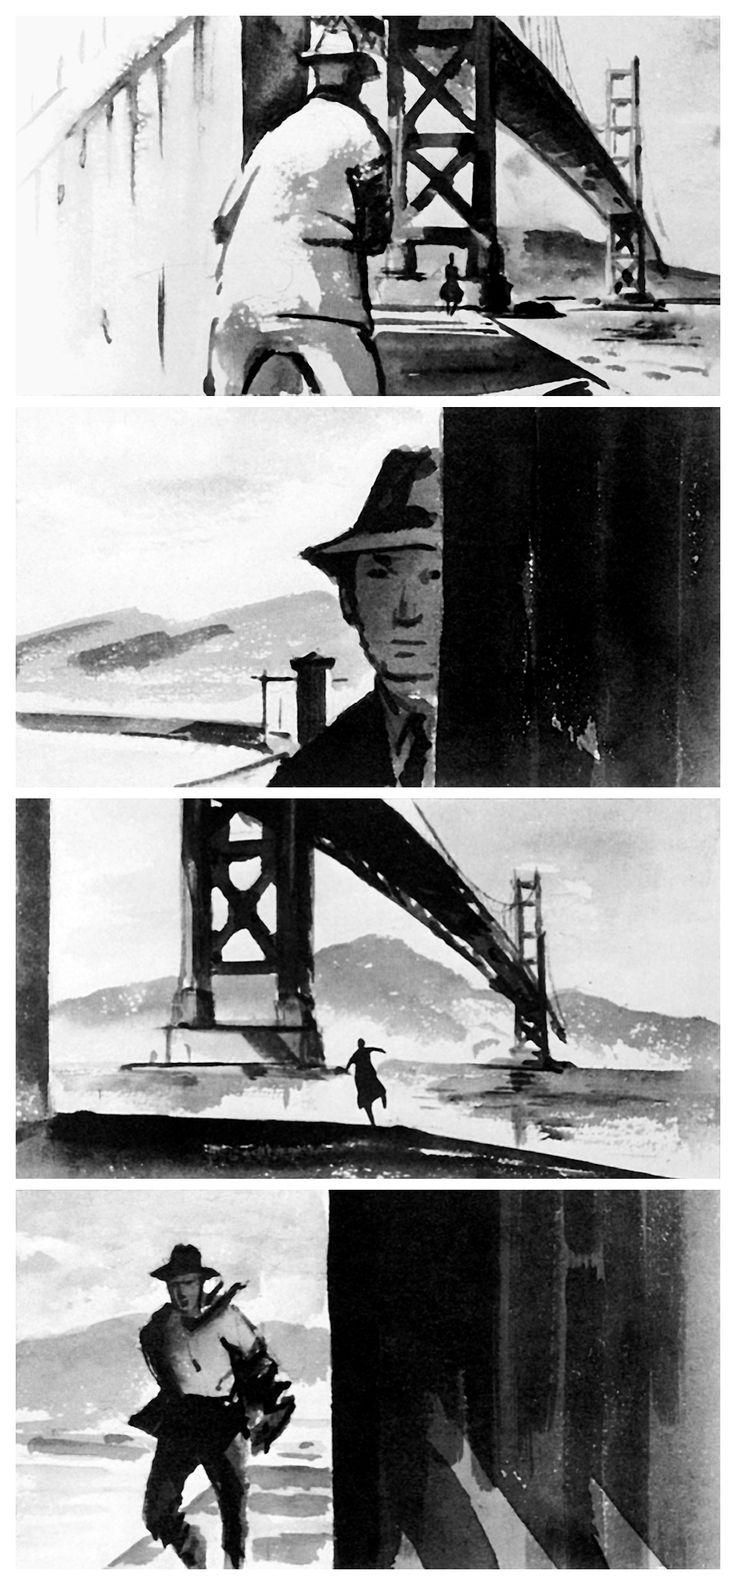 Storyboard sequence by art director Henry Bumstead for Vertigo.